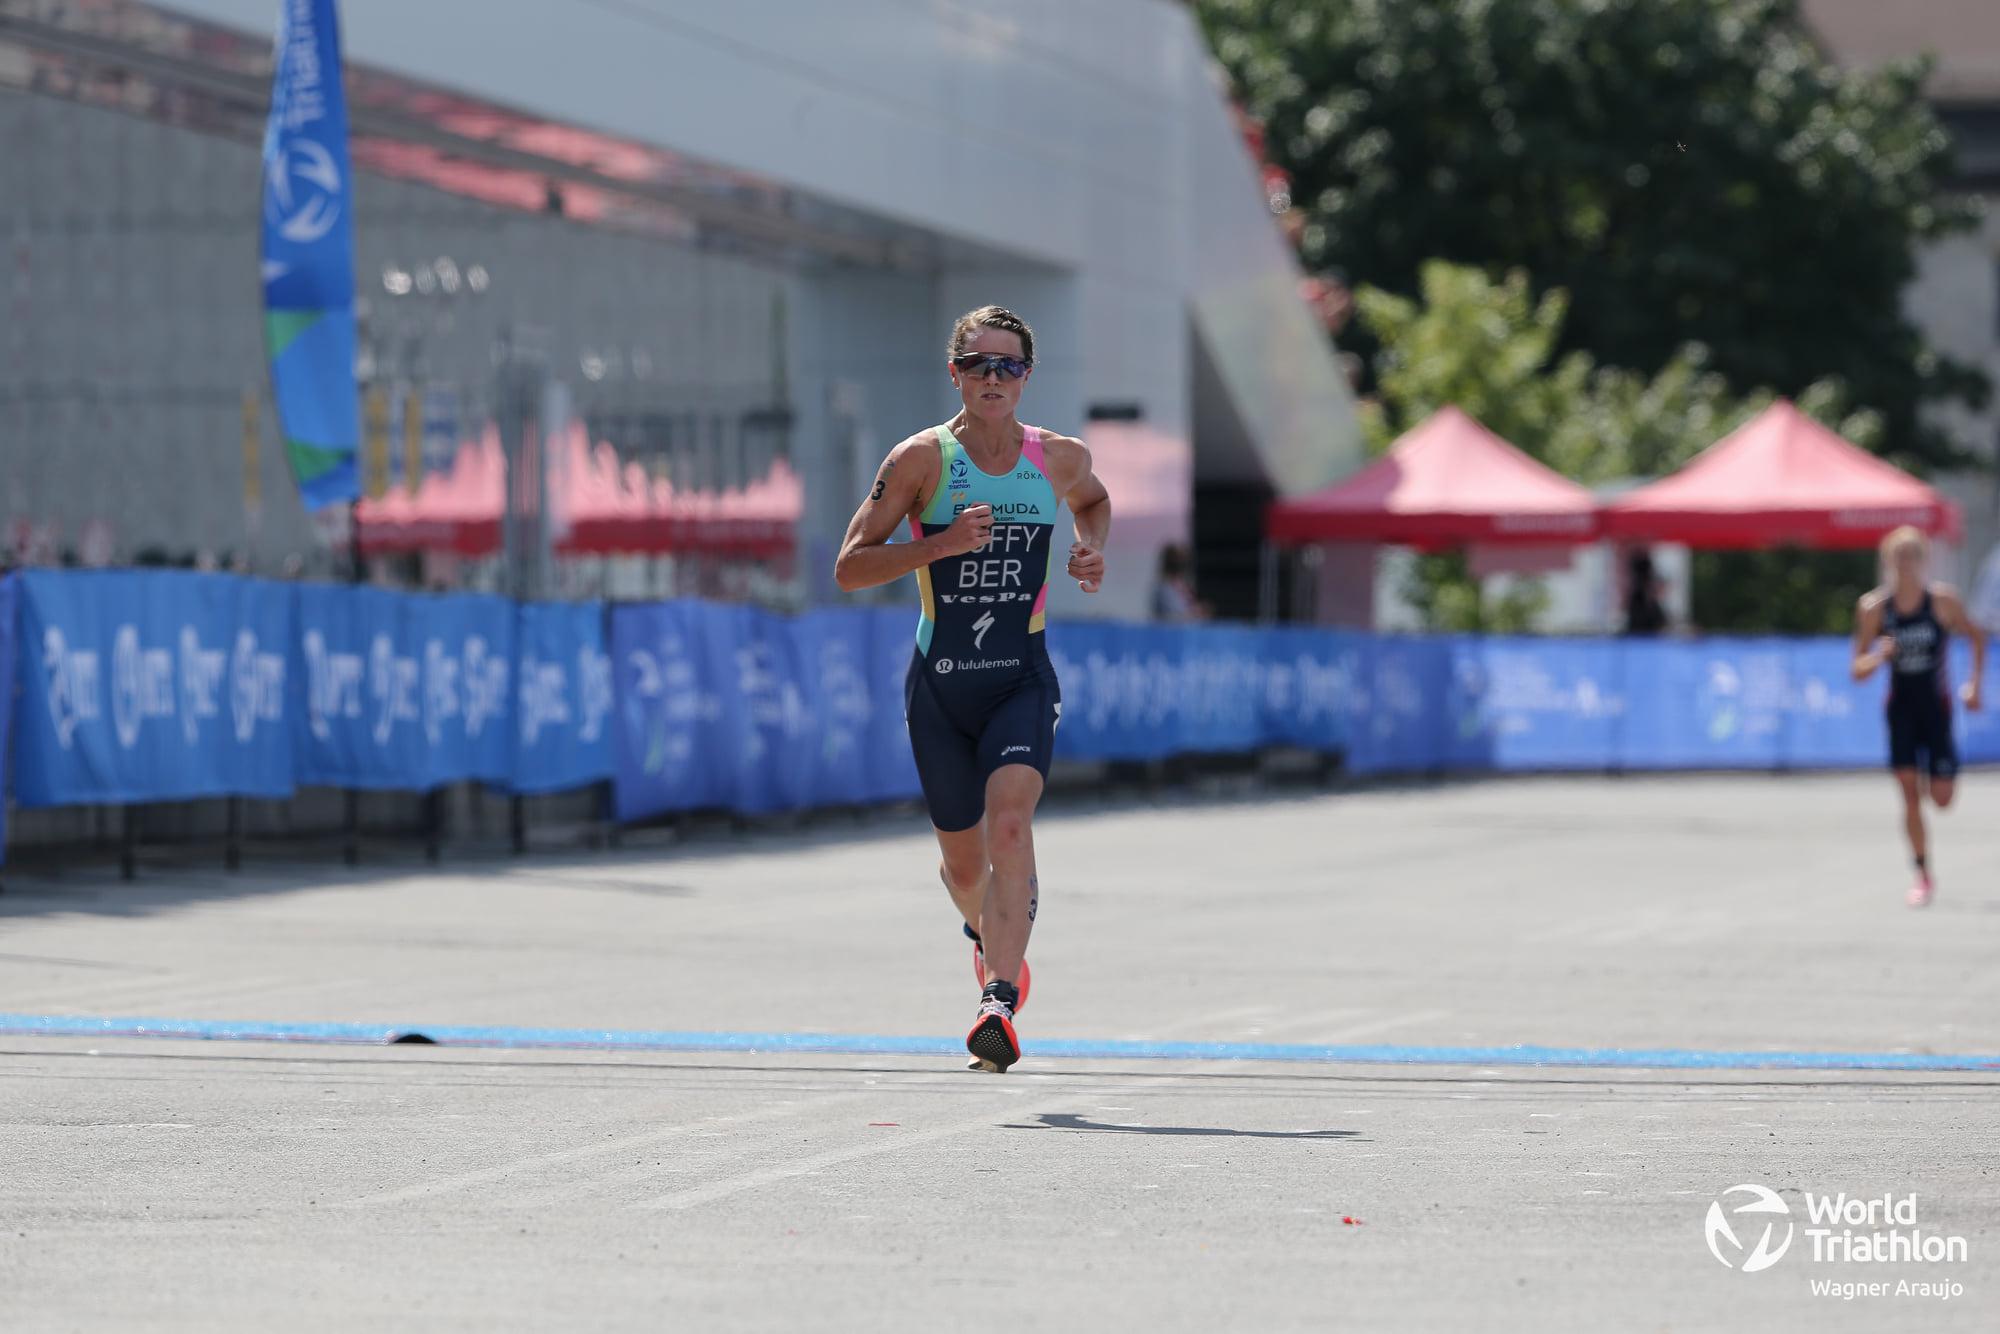 Bermudian tri Flora Duffy Montreal race Augist 2021 (8)